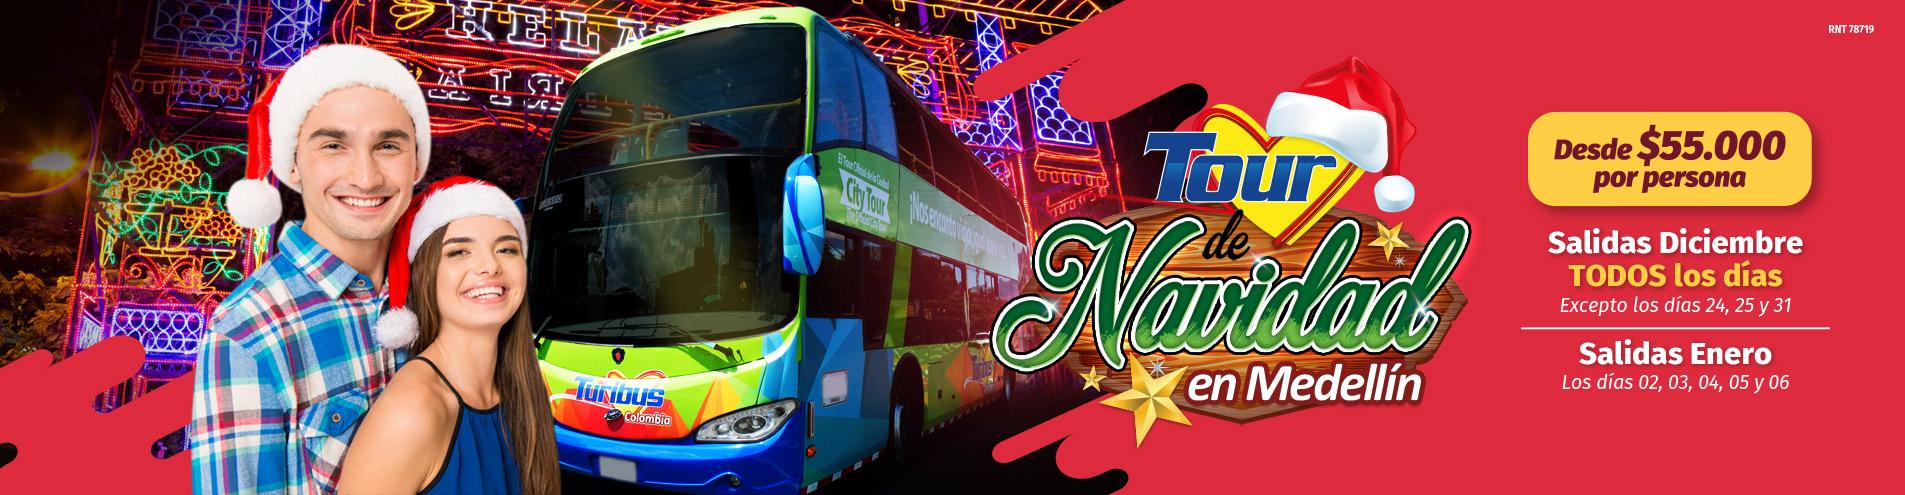 banner-tour-navidad-Medellin-Turibus